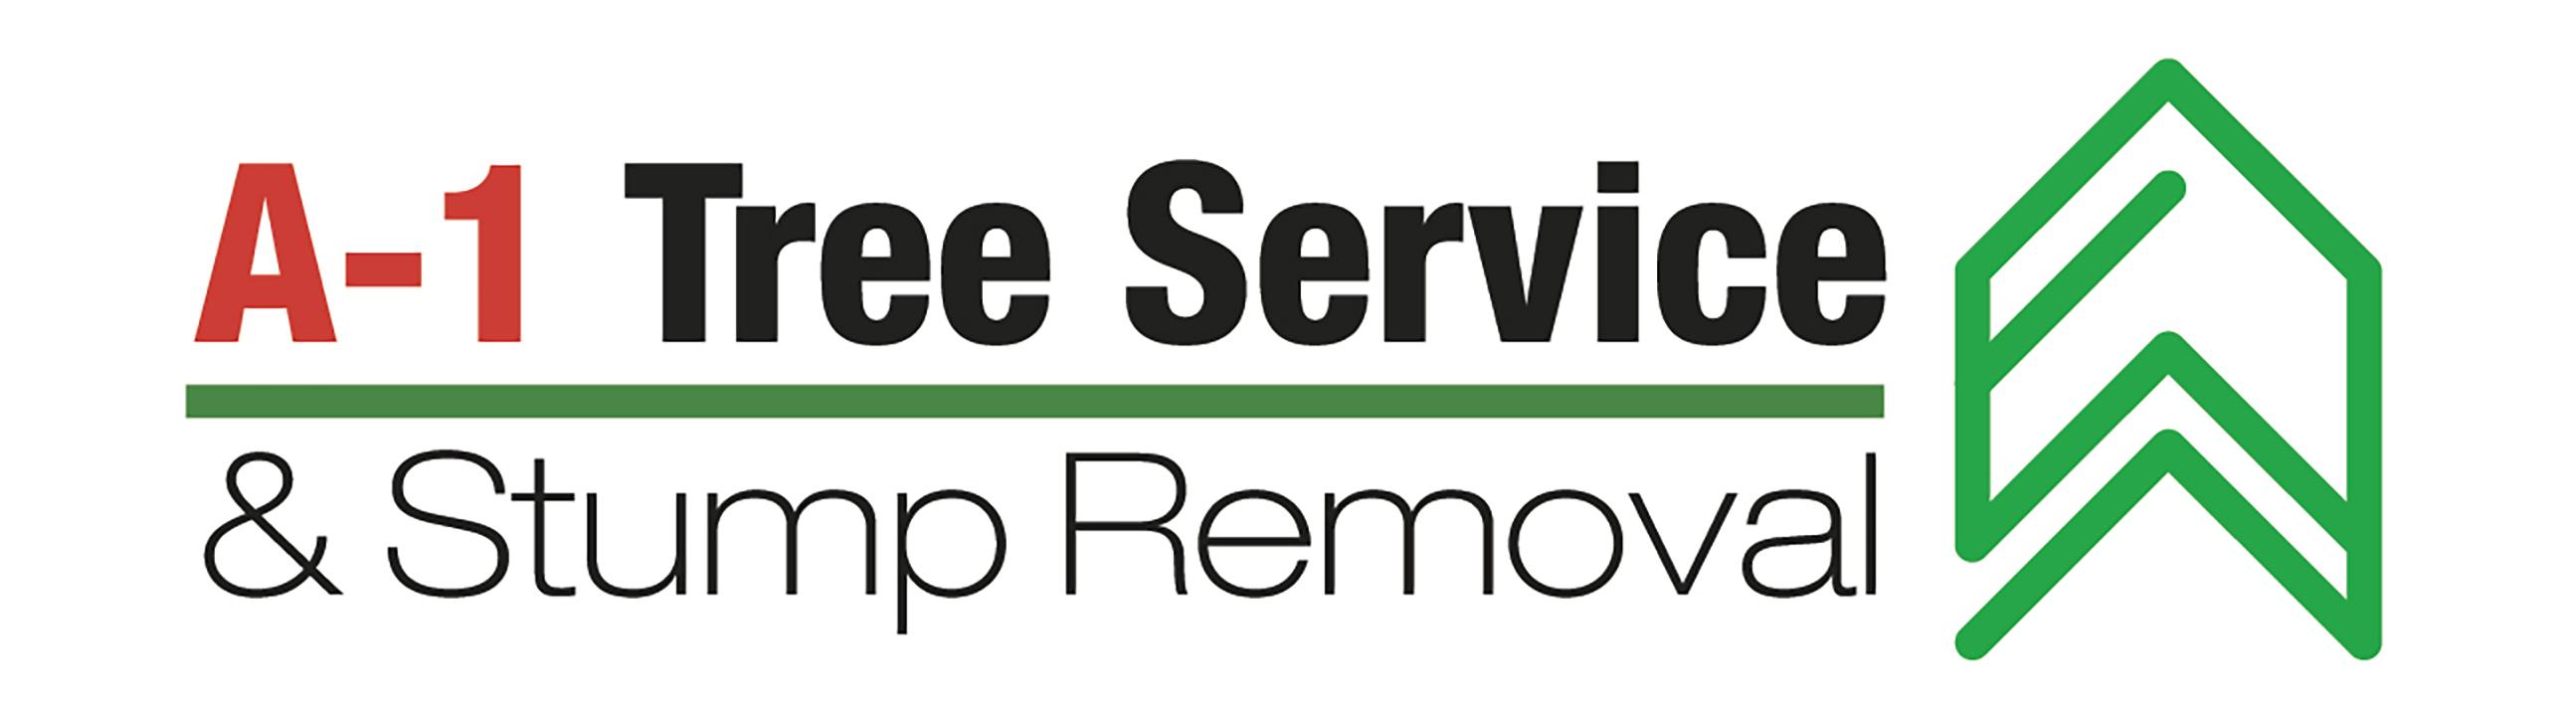 A-1 Tree Service - A-1 Tree Service & Stump Removal